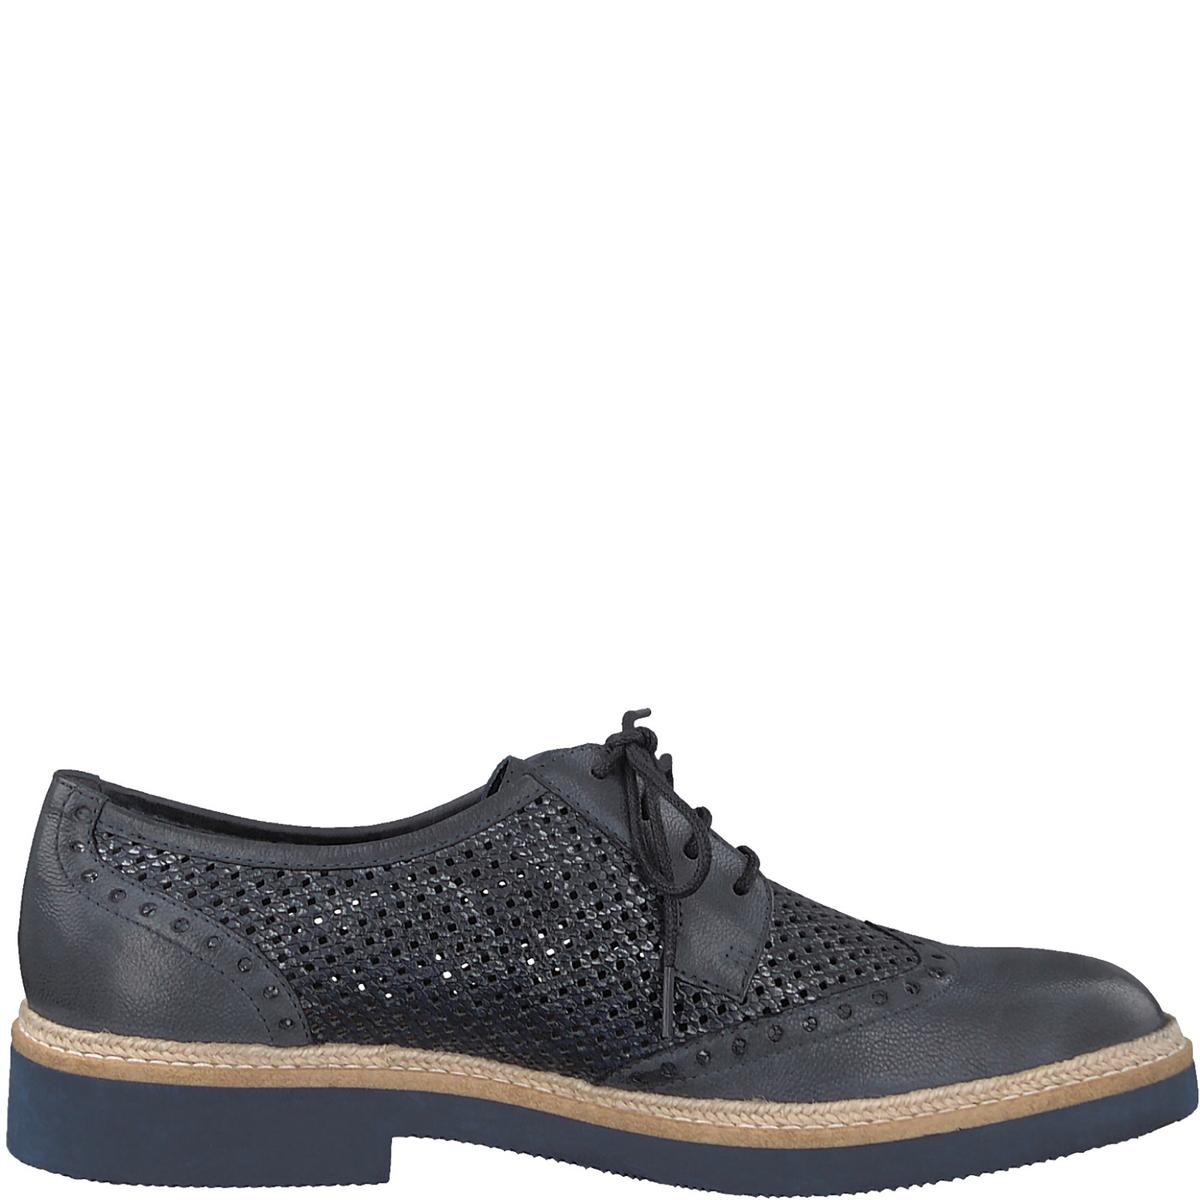 Ботинки-дерби ботинки дерби d janalee a